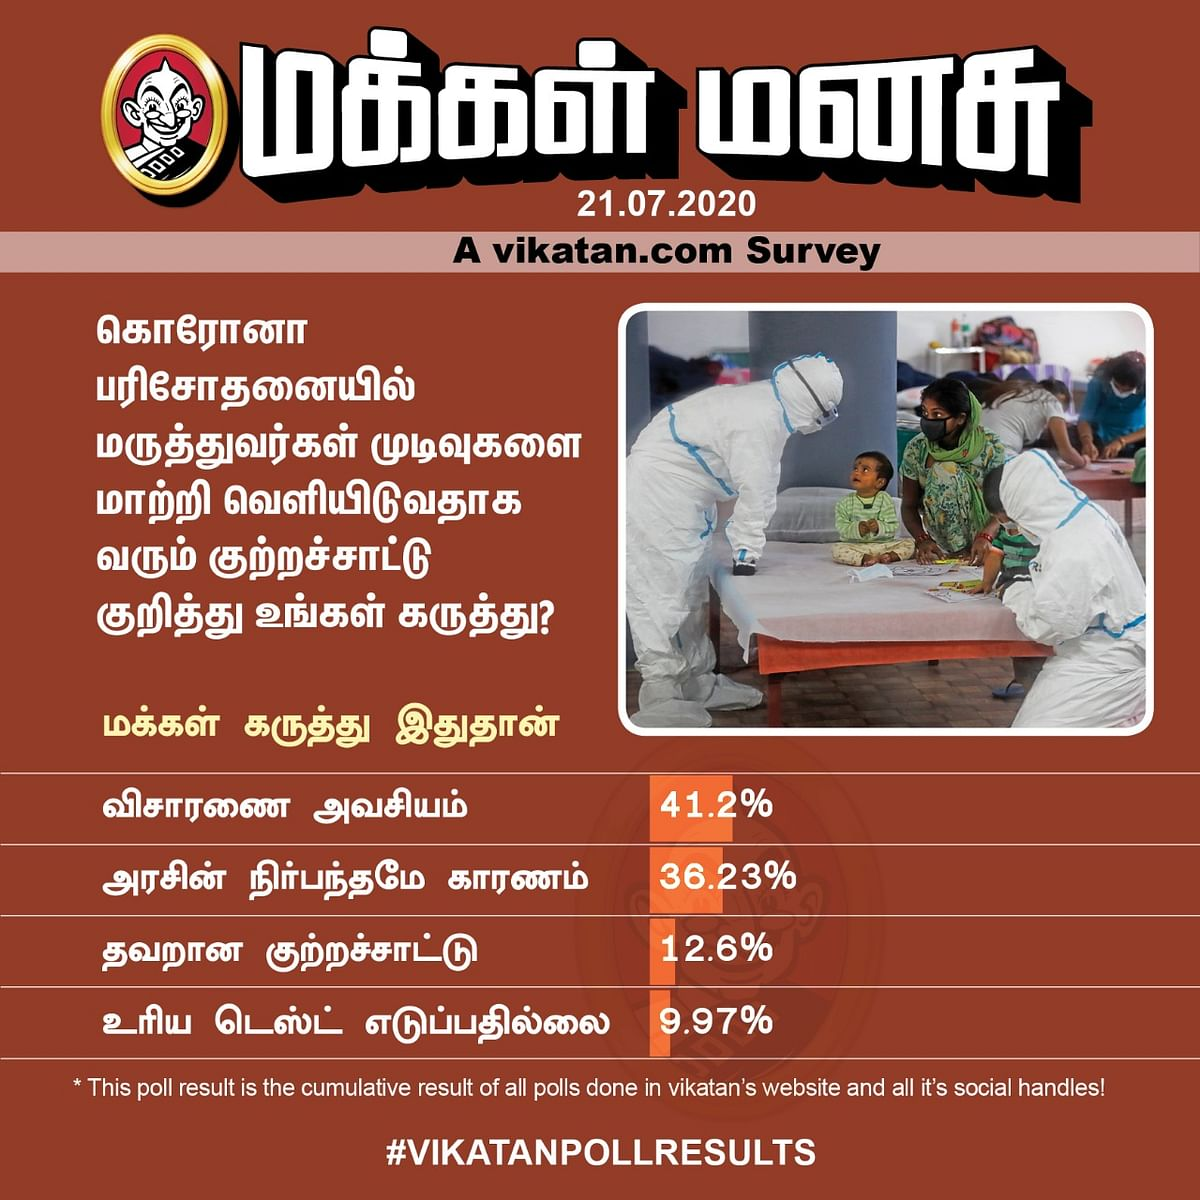 Corona Test | Vikatan Poll